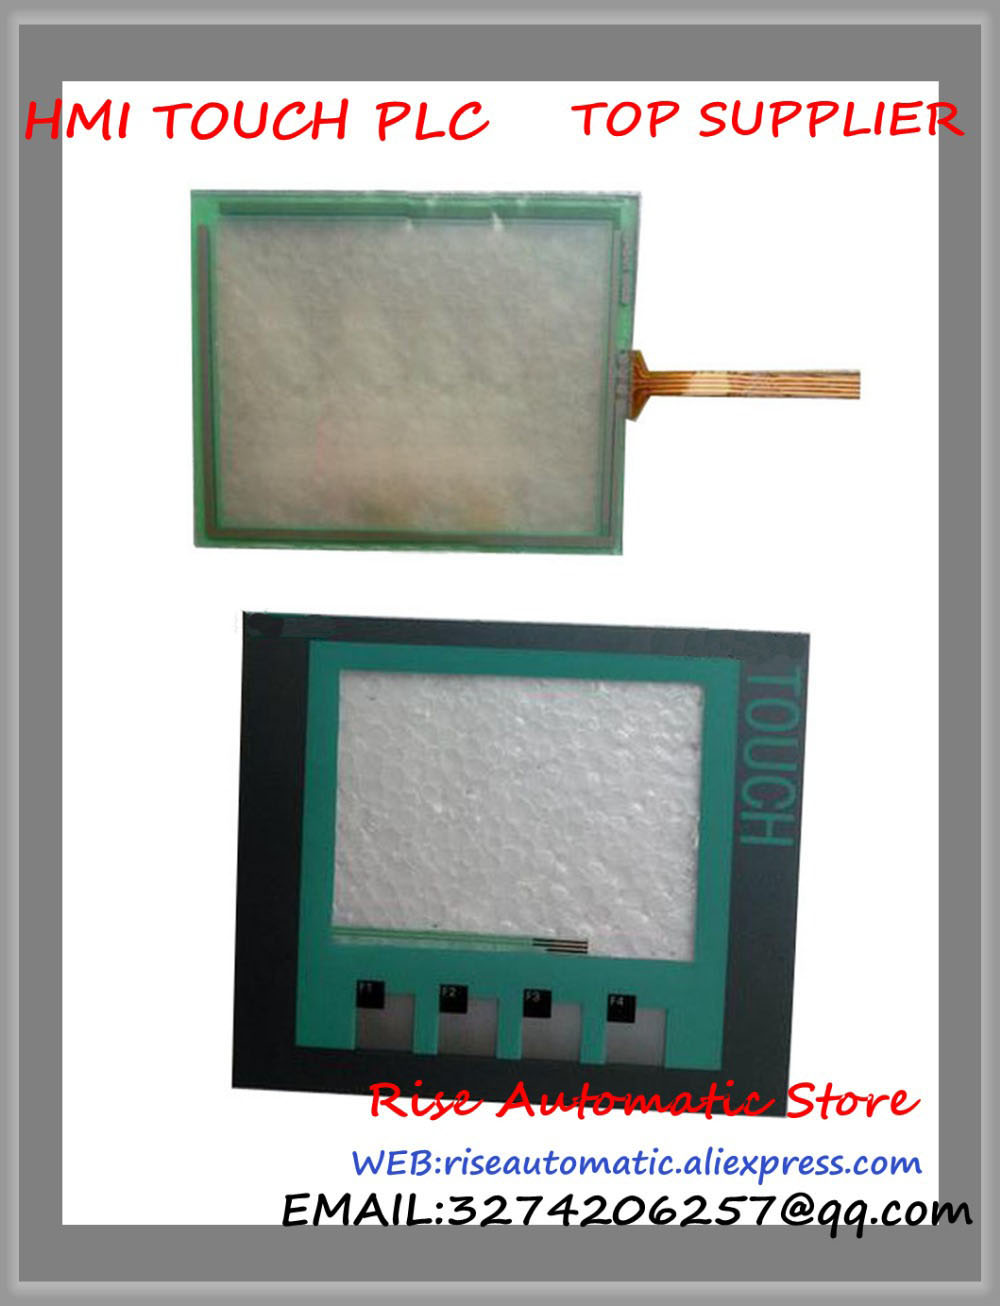 New for SIMATIC KTP400 4 Inch Touch Panel HMI 6AV6647-0AA11-3AX0 6AV66470AA113AX0 Keypad Membrane + Touch Glass 6fx2007 1ad03 mini handheld unit sinumerik simatic hmi keypad protective film membrance